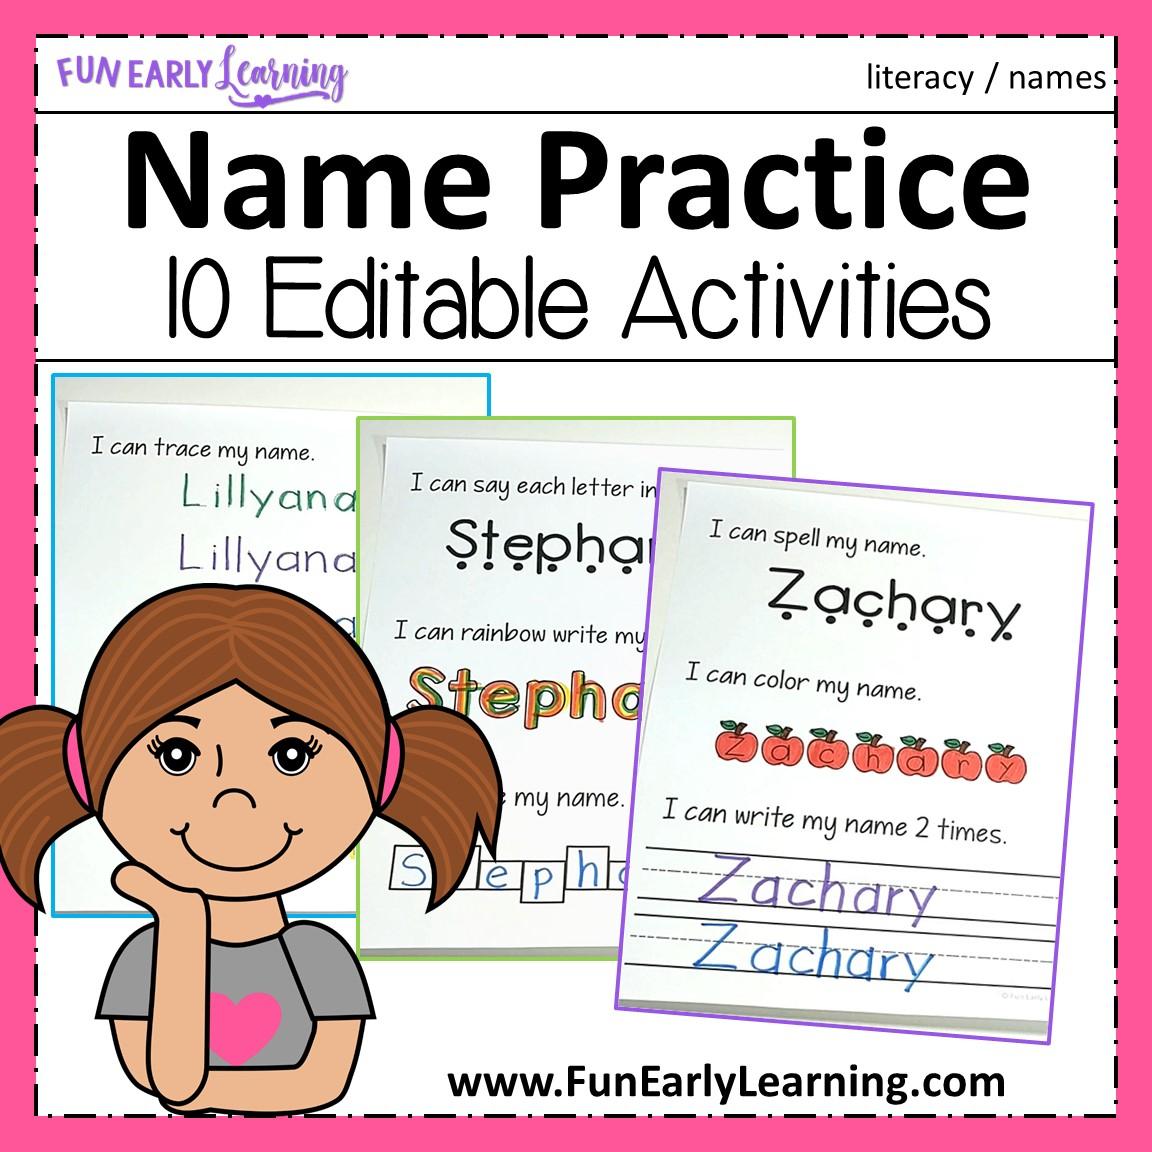 Editable Name Practice for Editable Name Tracing Preschool